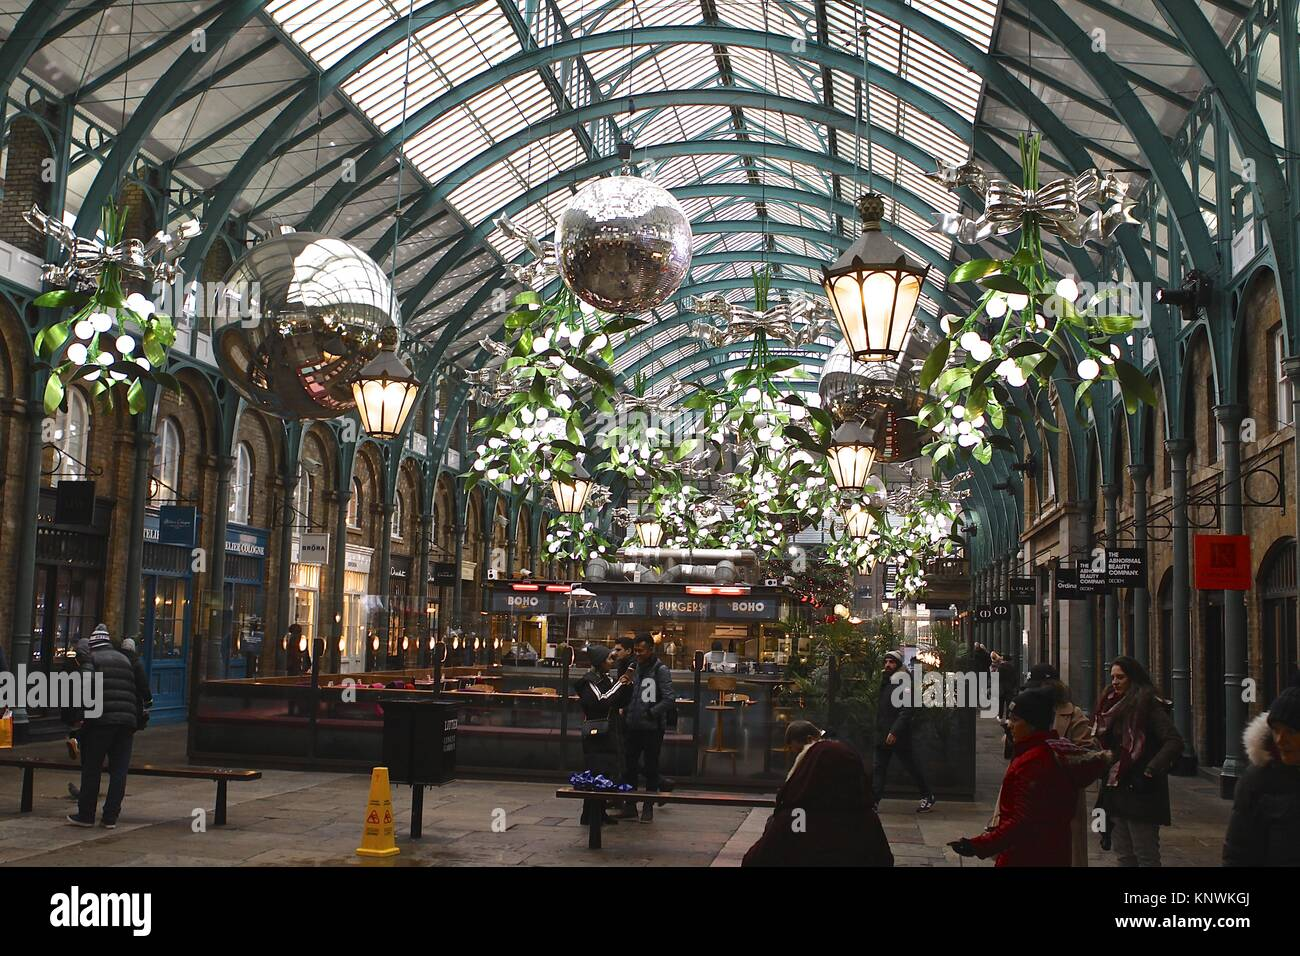 Covent Garden London England Christmas 2017 - Stock Image